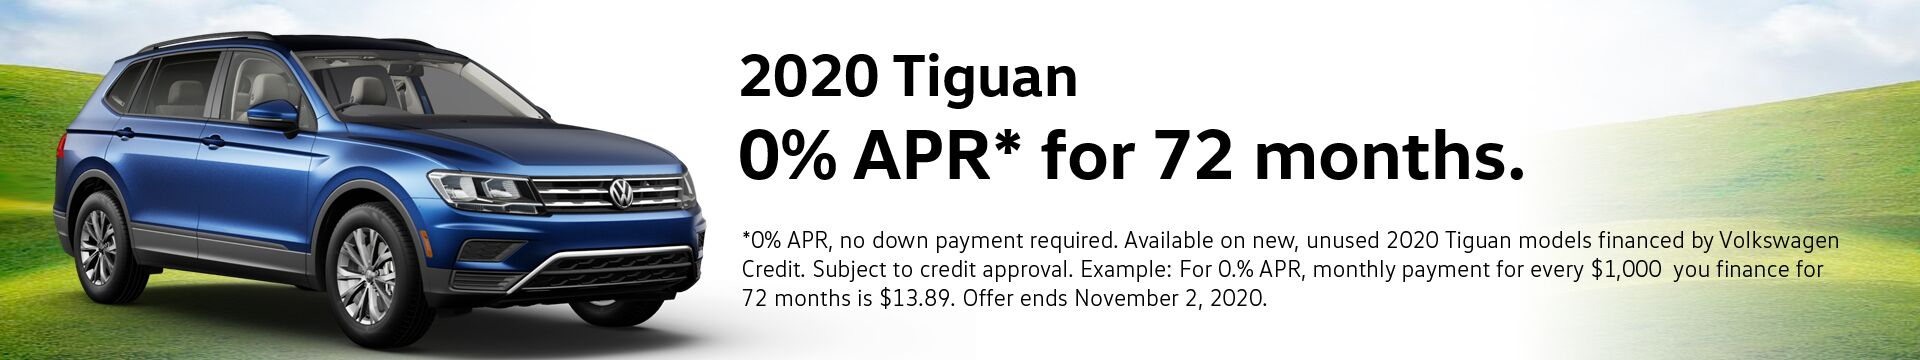 VW Tiguan Finance Special